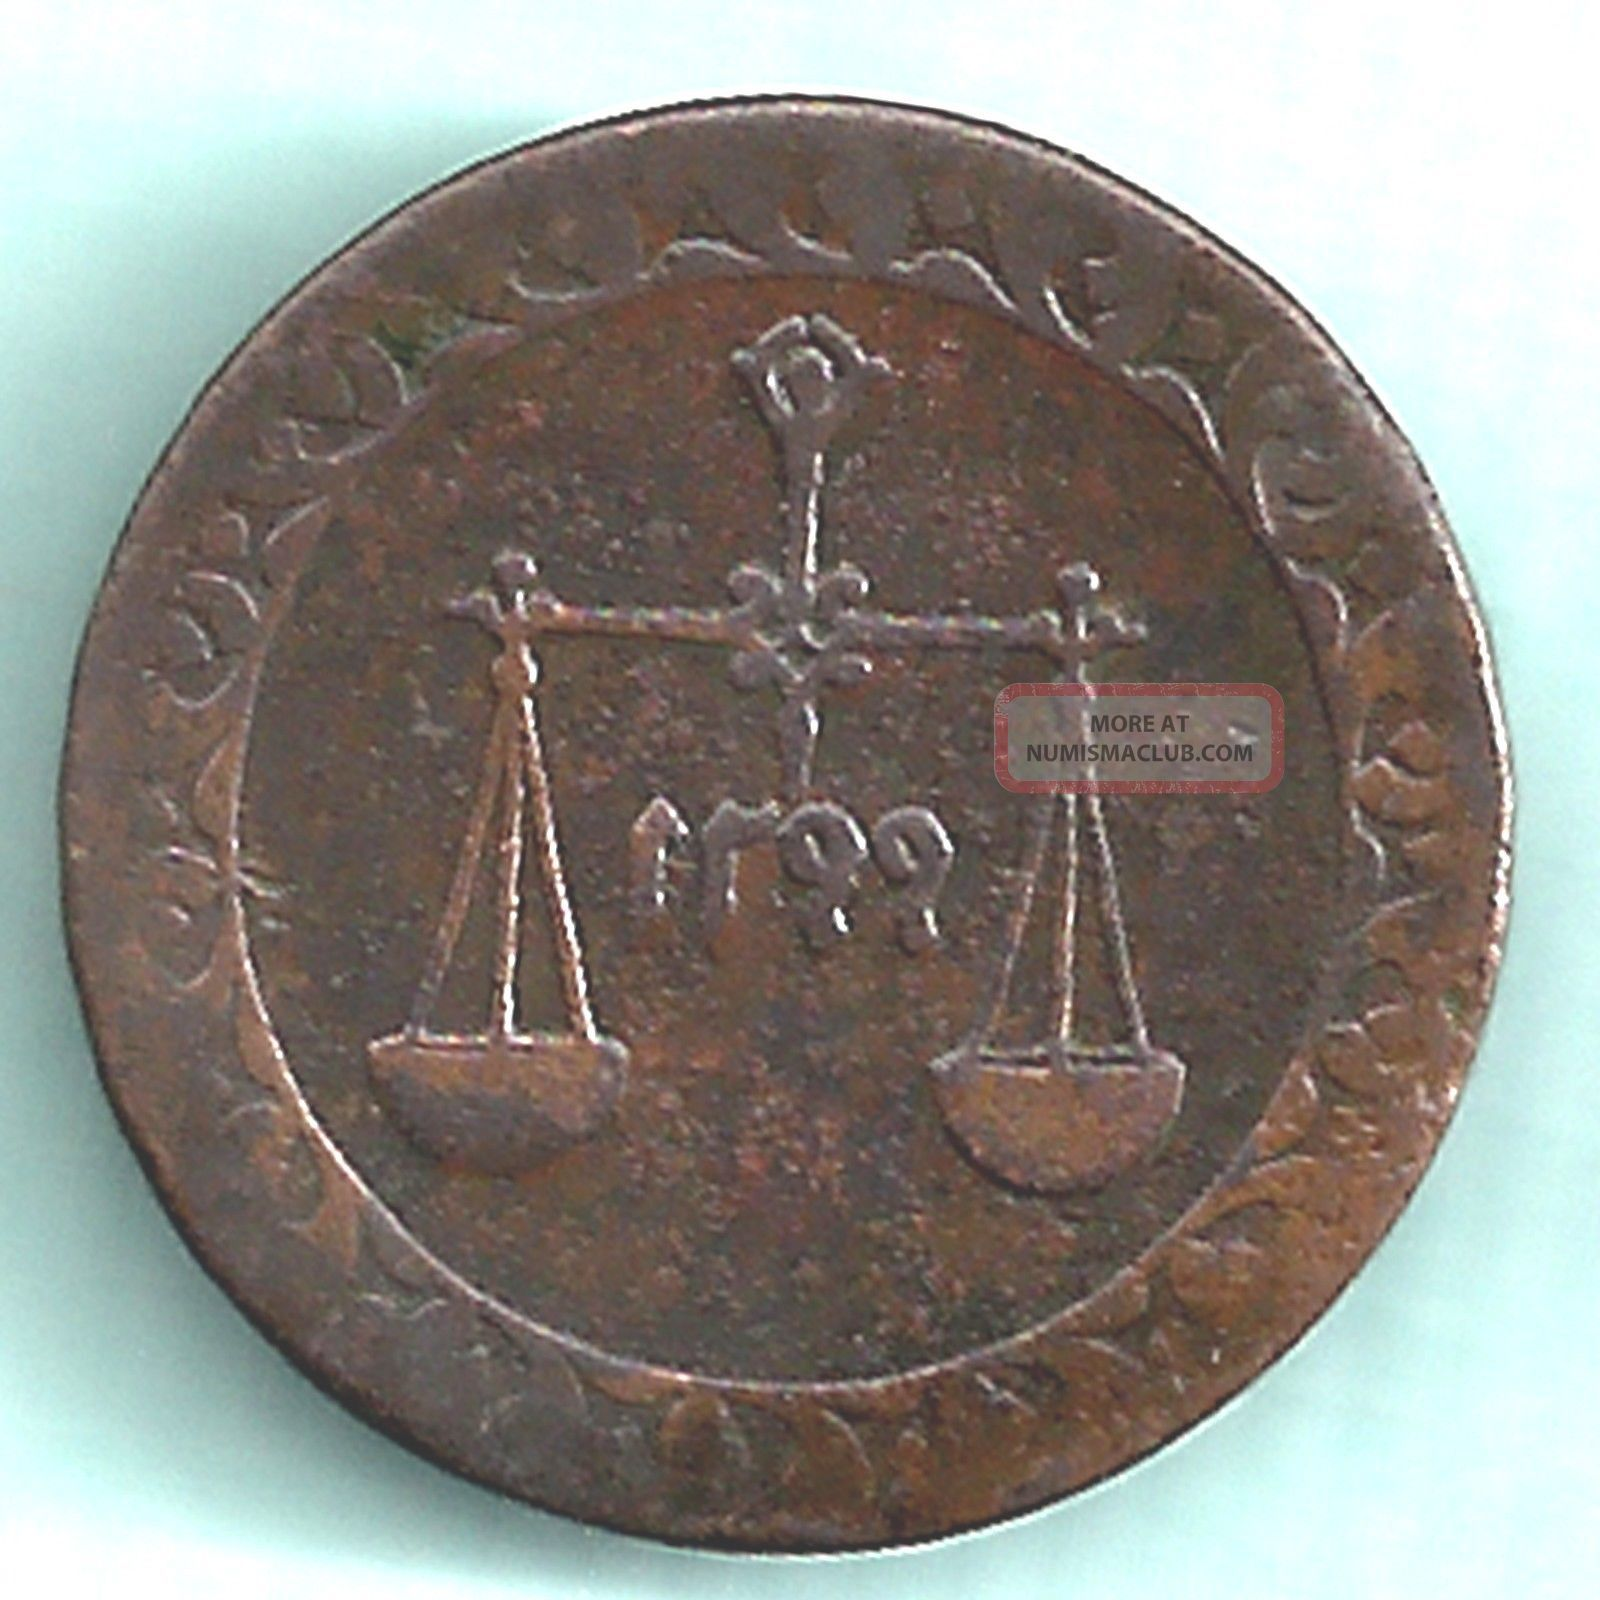 Zanzibar Island - Ah 1299 - Sultan Bargash Ibn Sa ' Id - 1/4 Anna - Rarest Coin Middle East photo